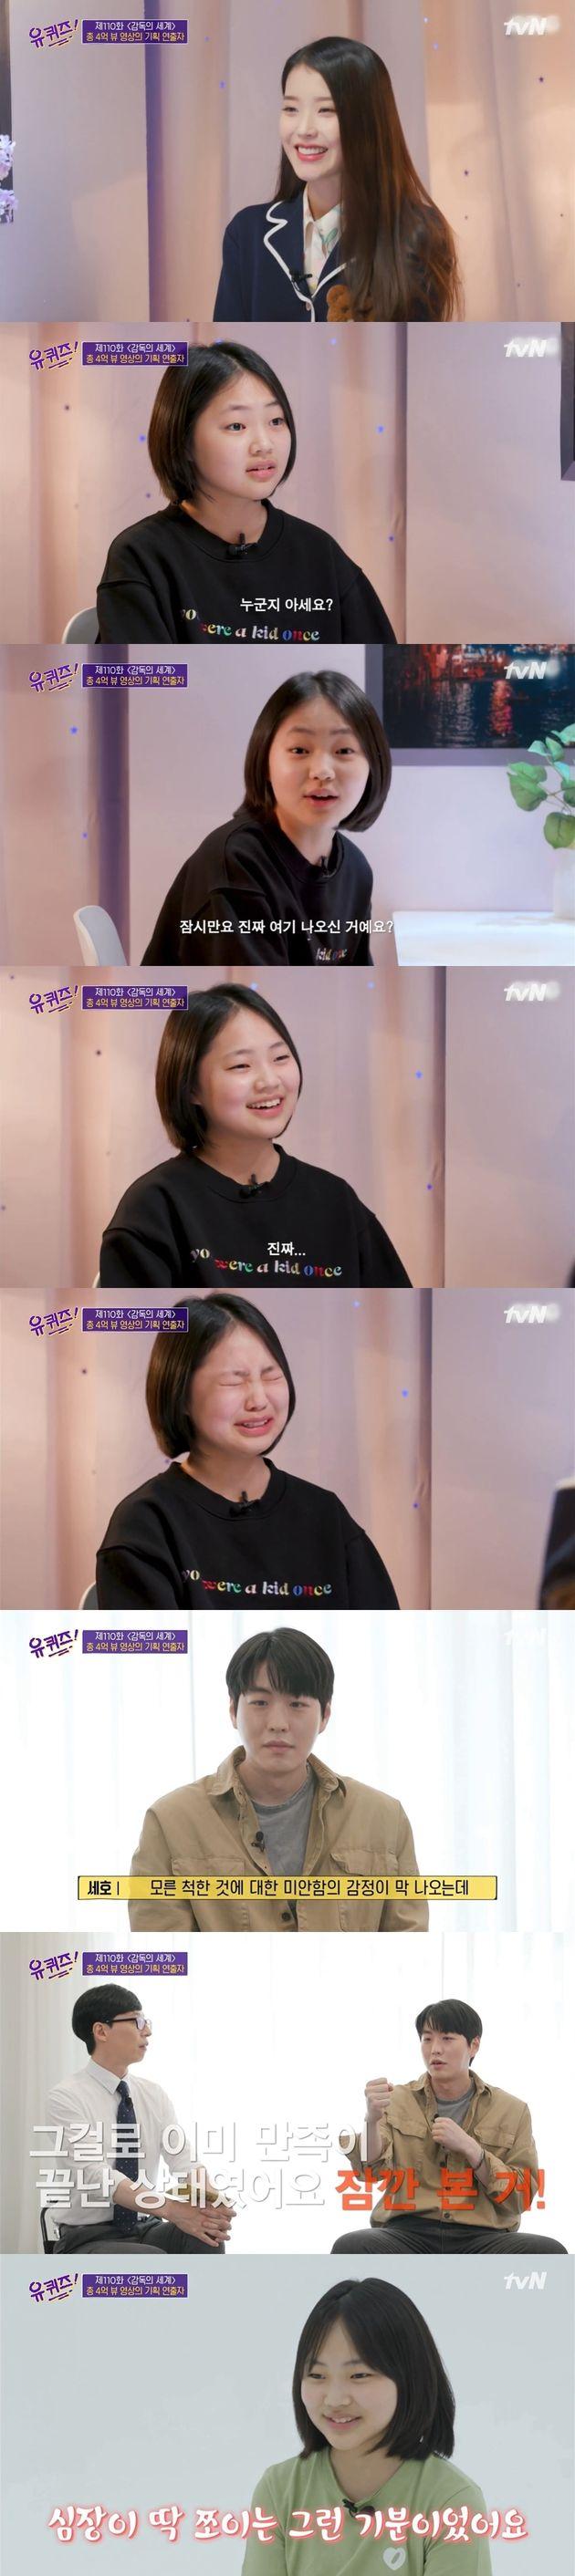 tvN '유 퀴즈 온 더